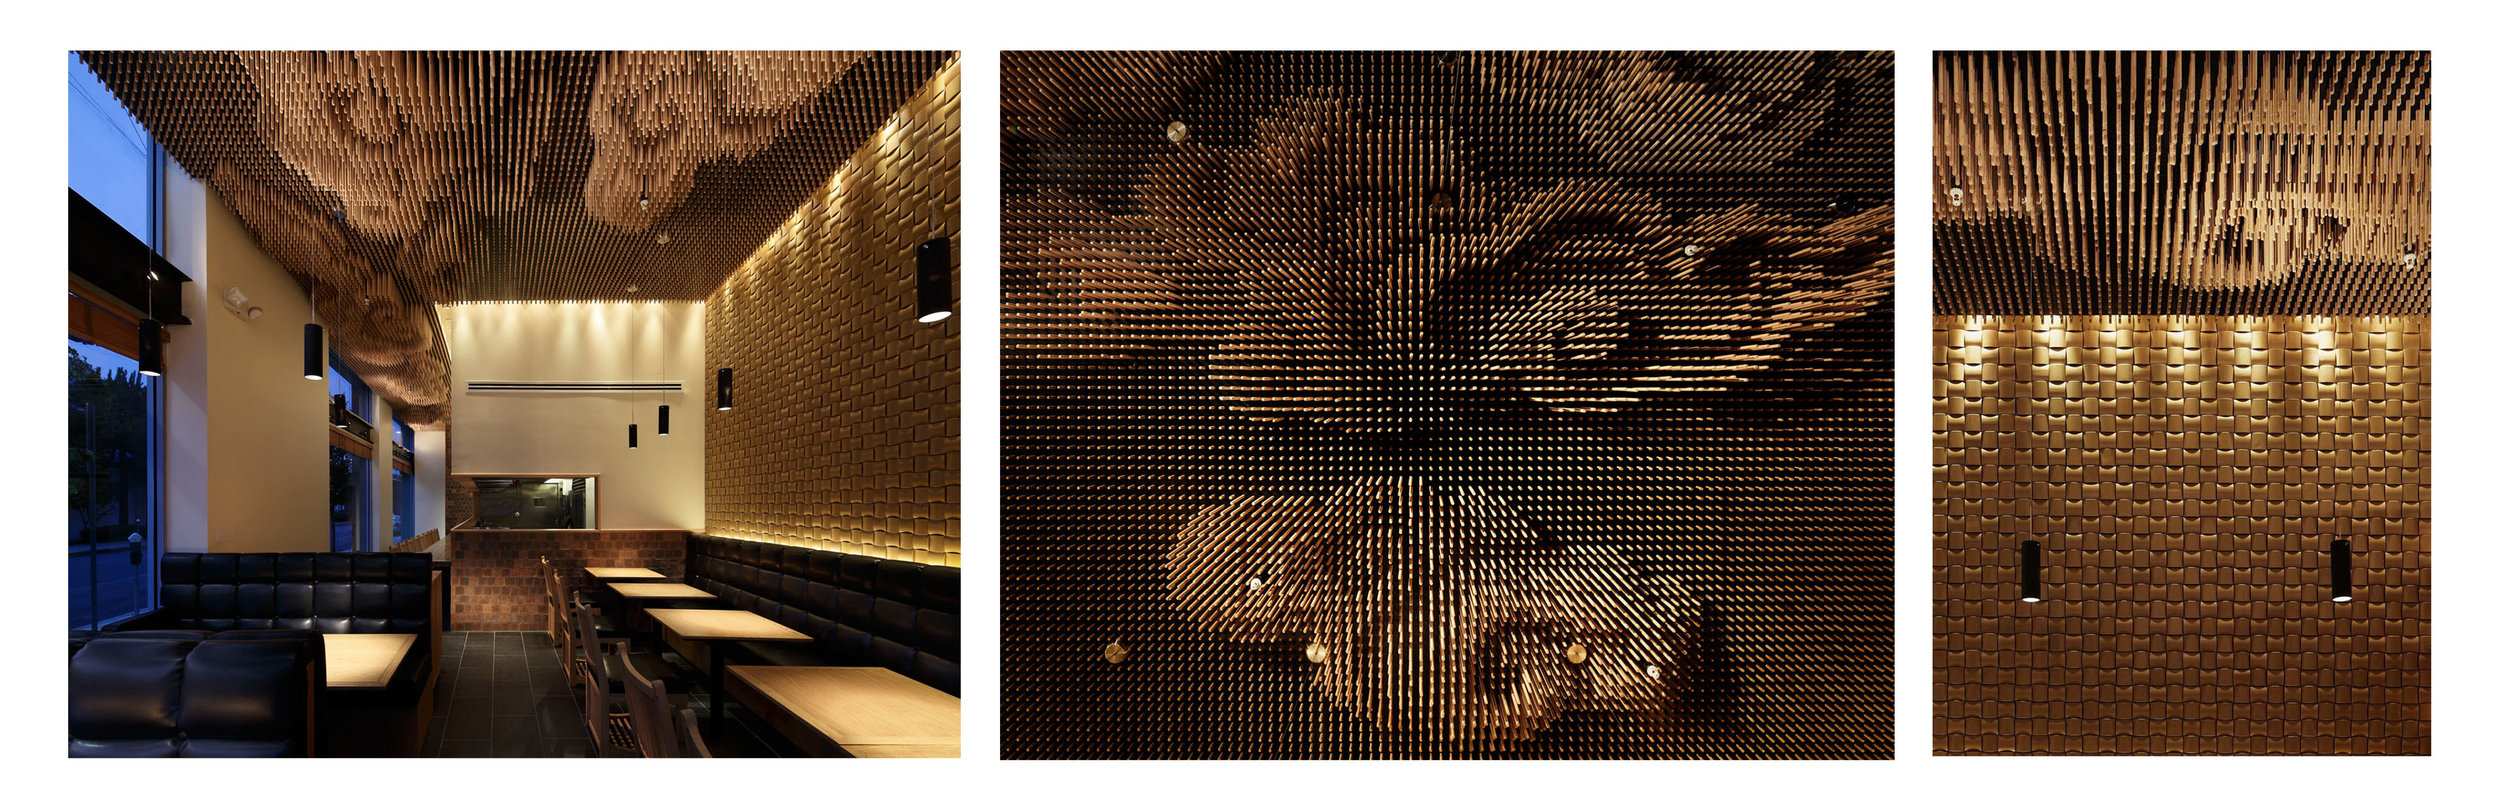 LA Tsujita /Shanghai Hilton,Cigar lounge Libre /SweeT co.,ltd